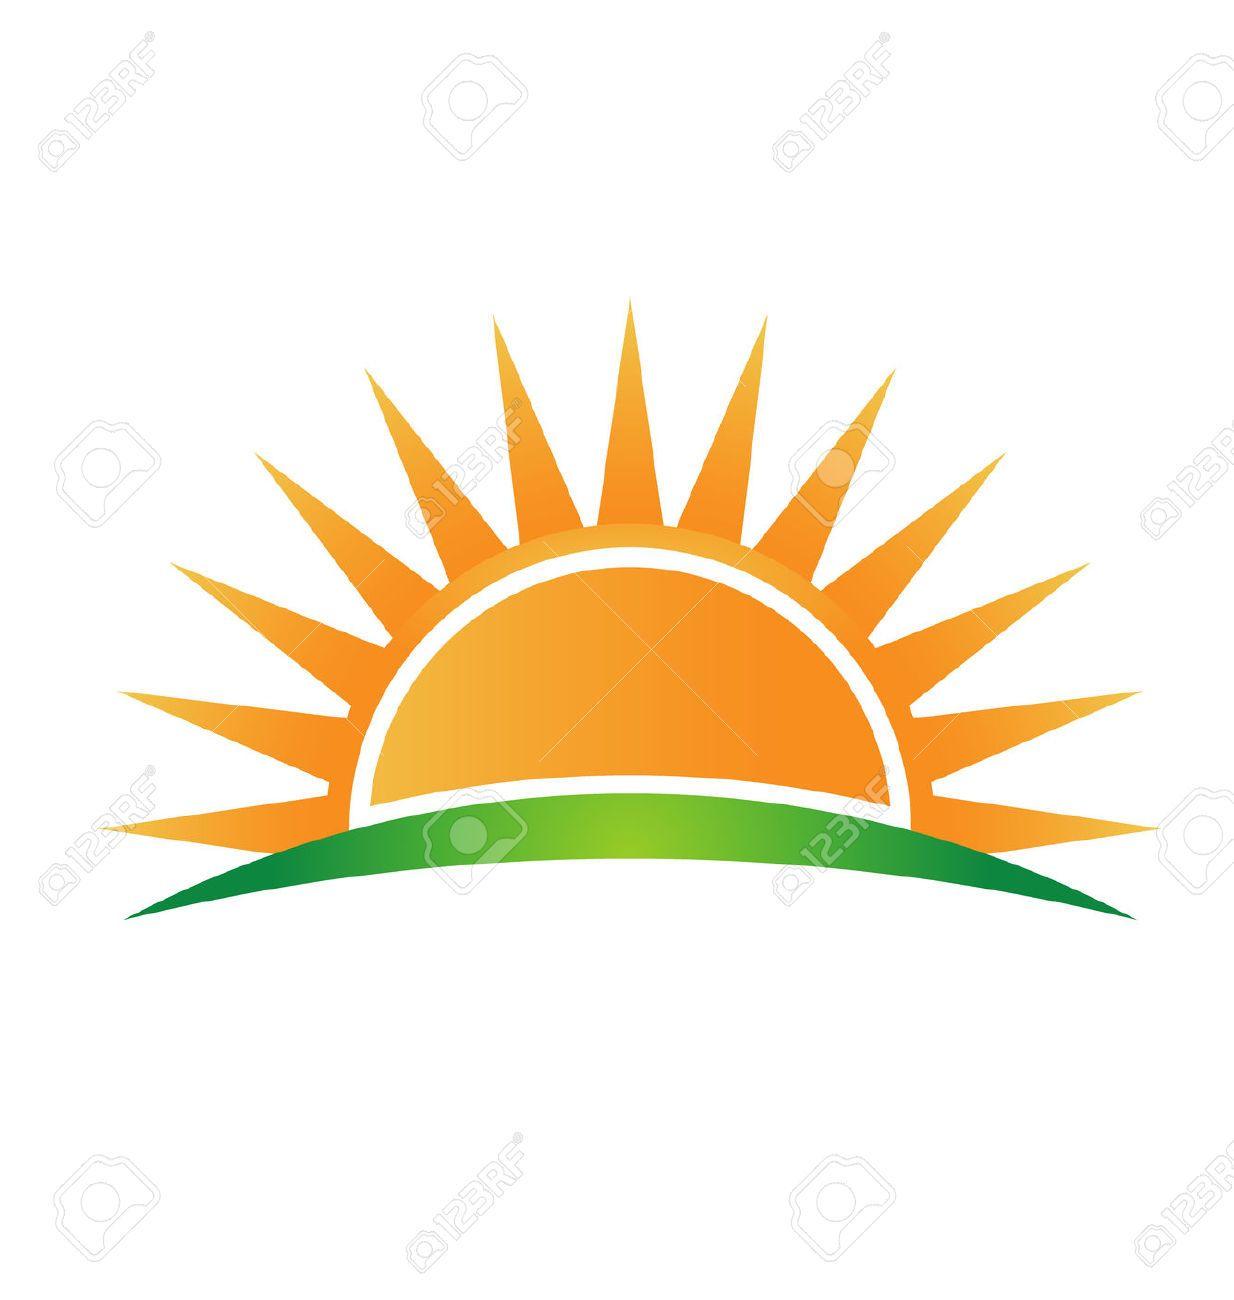 Sun Clipart Sunrise in 2019.